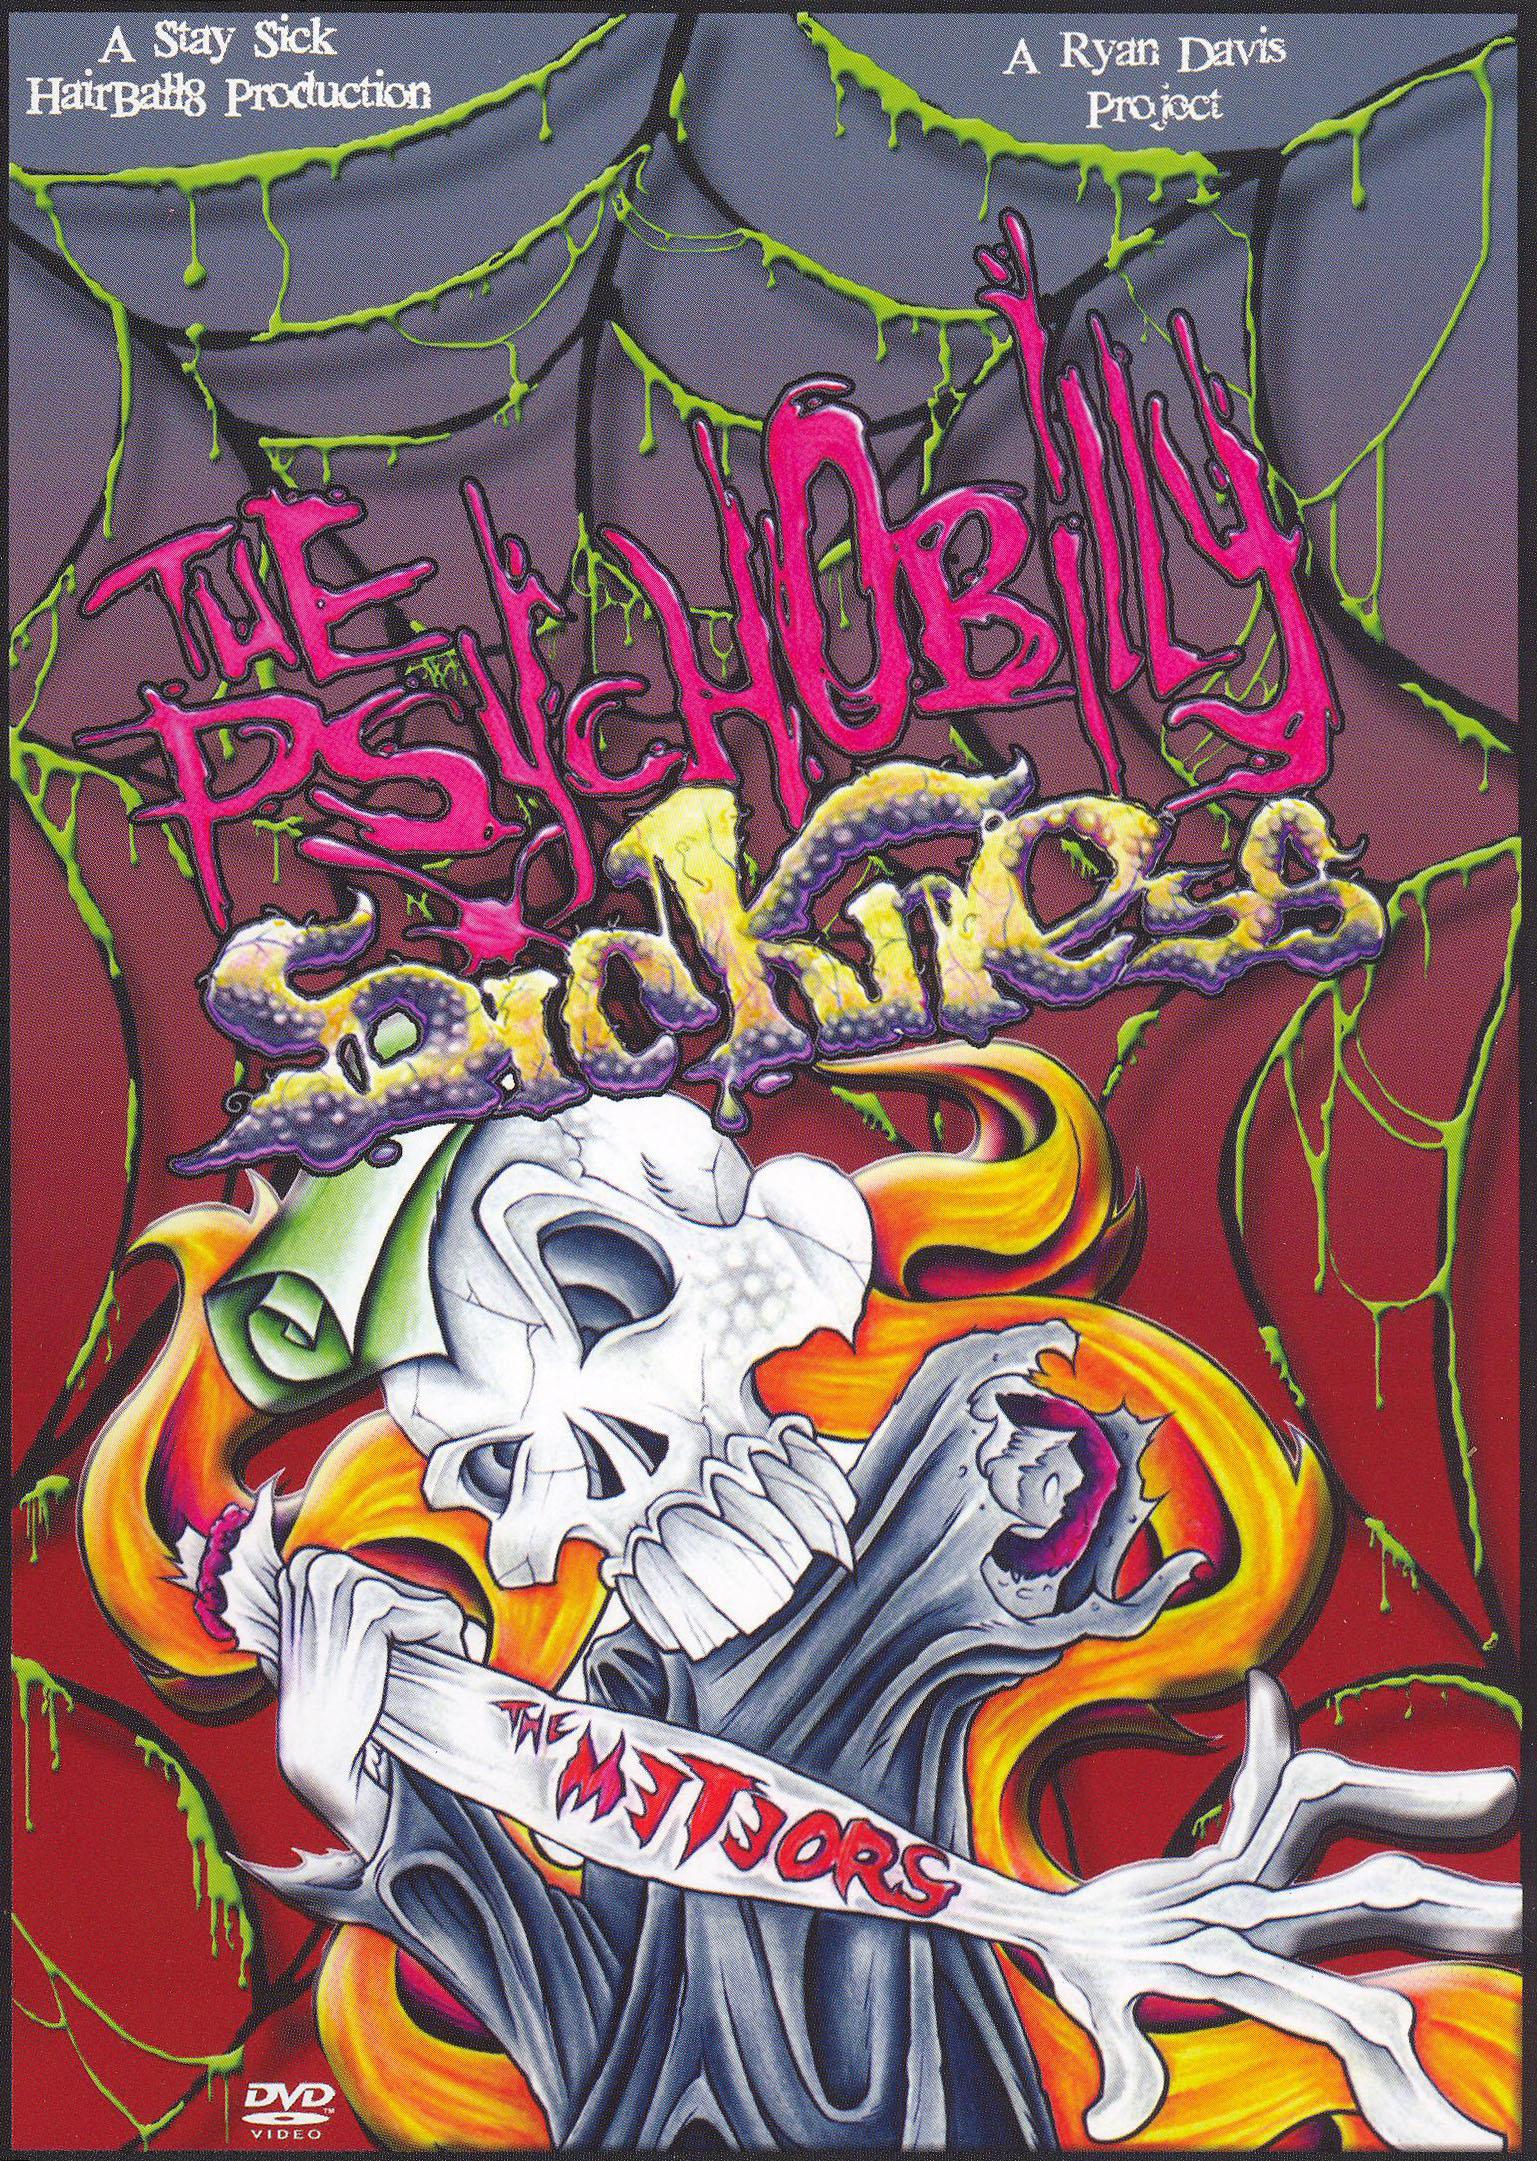 The Psychobilly Sickness, Episode 1